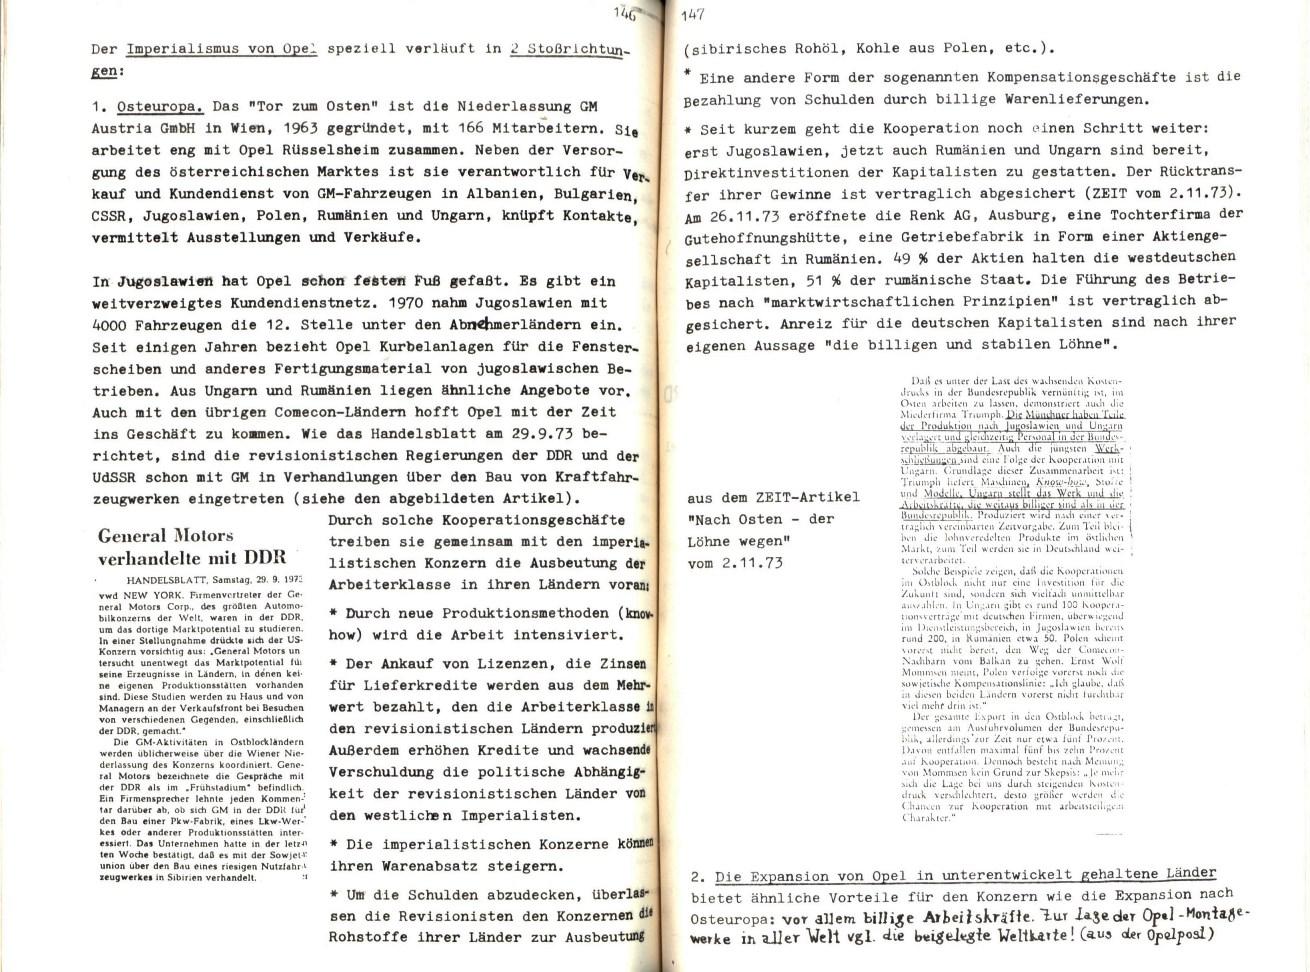 Bochum_IGM_Opel_PG_Opel_streikt_1973_076